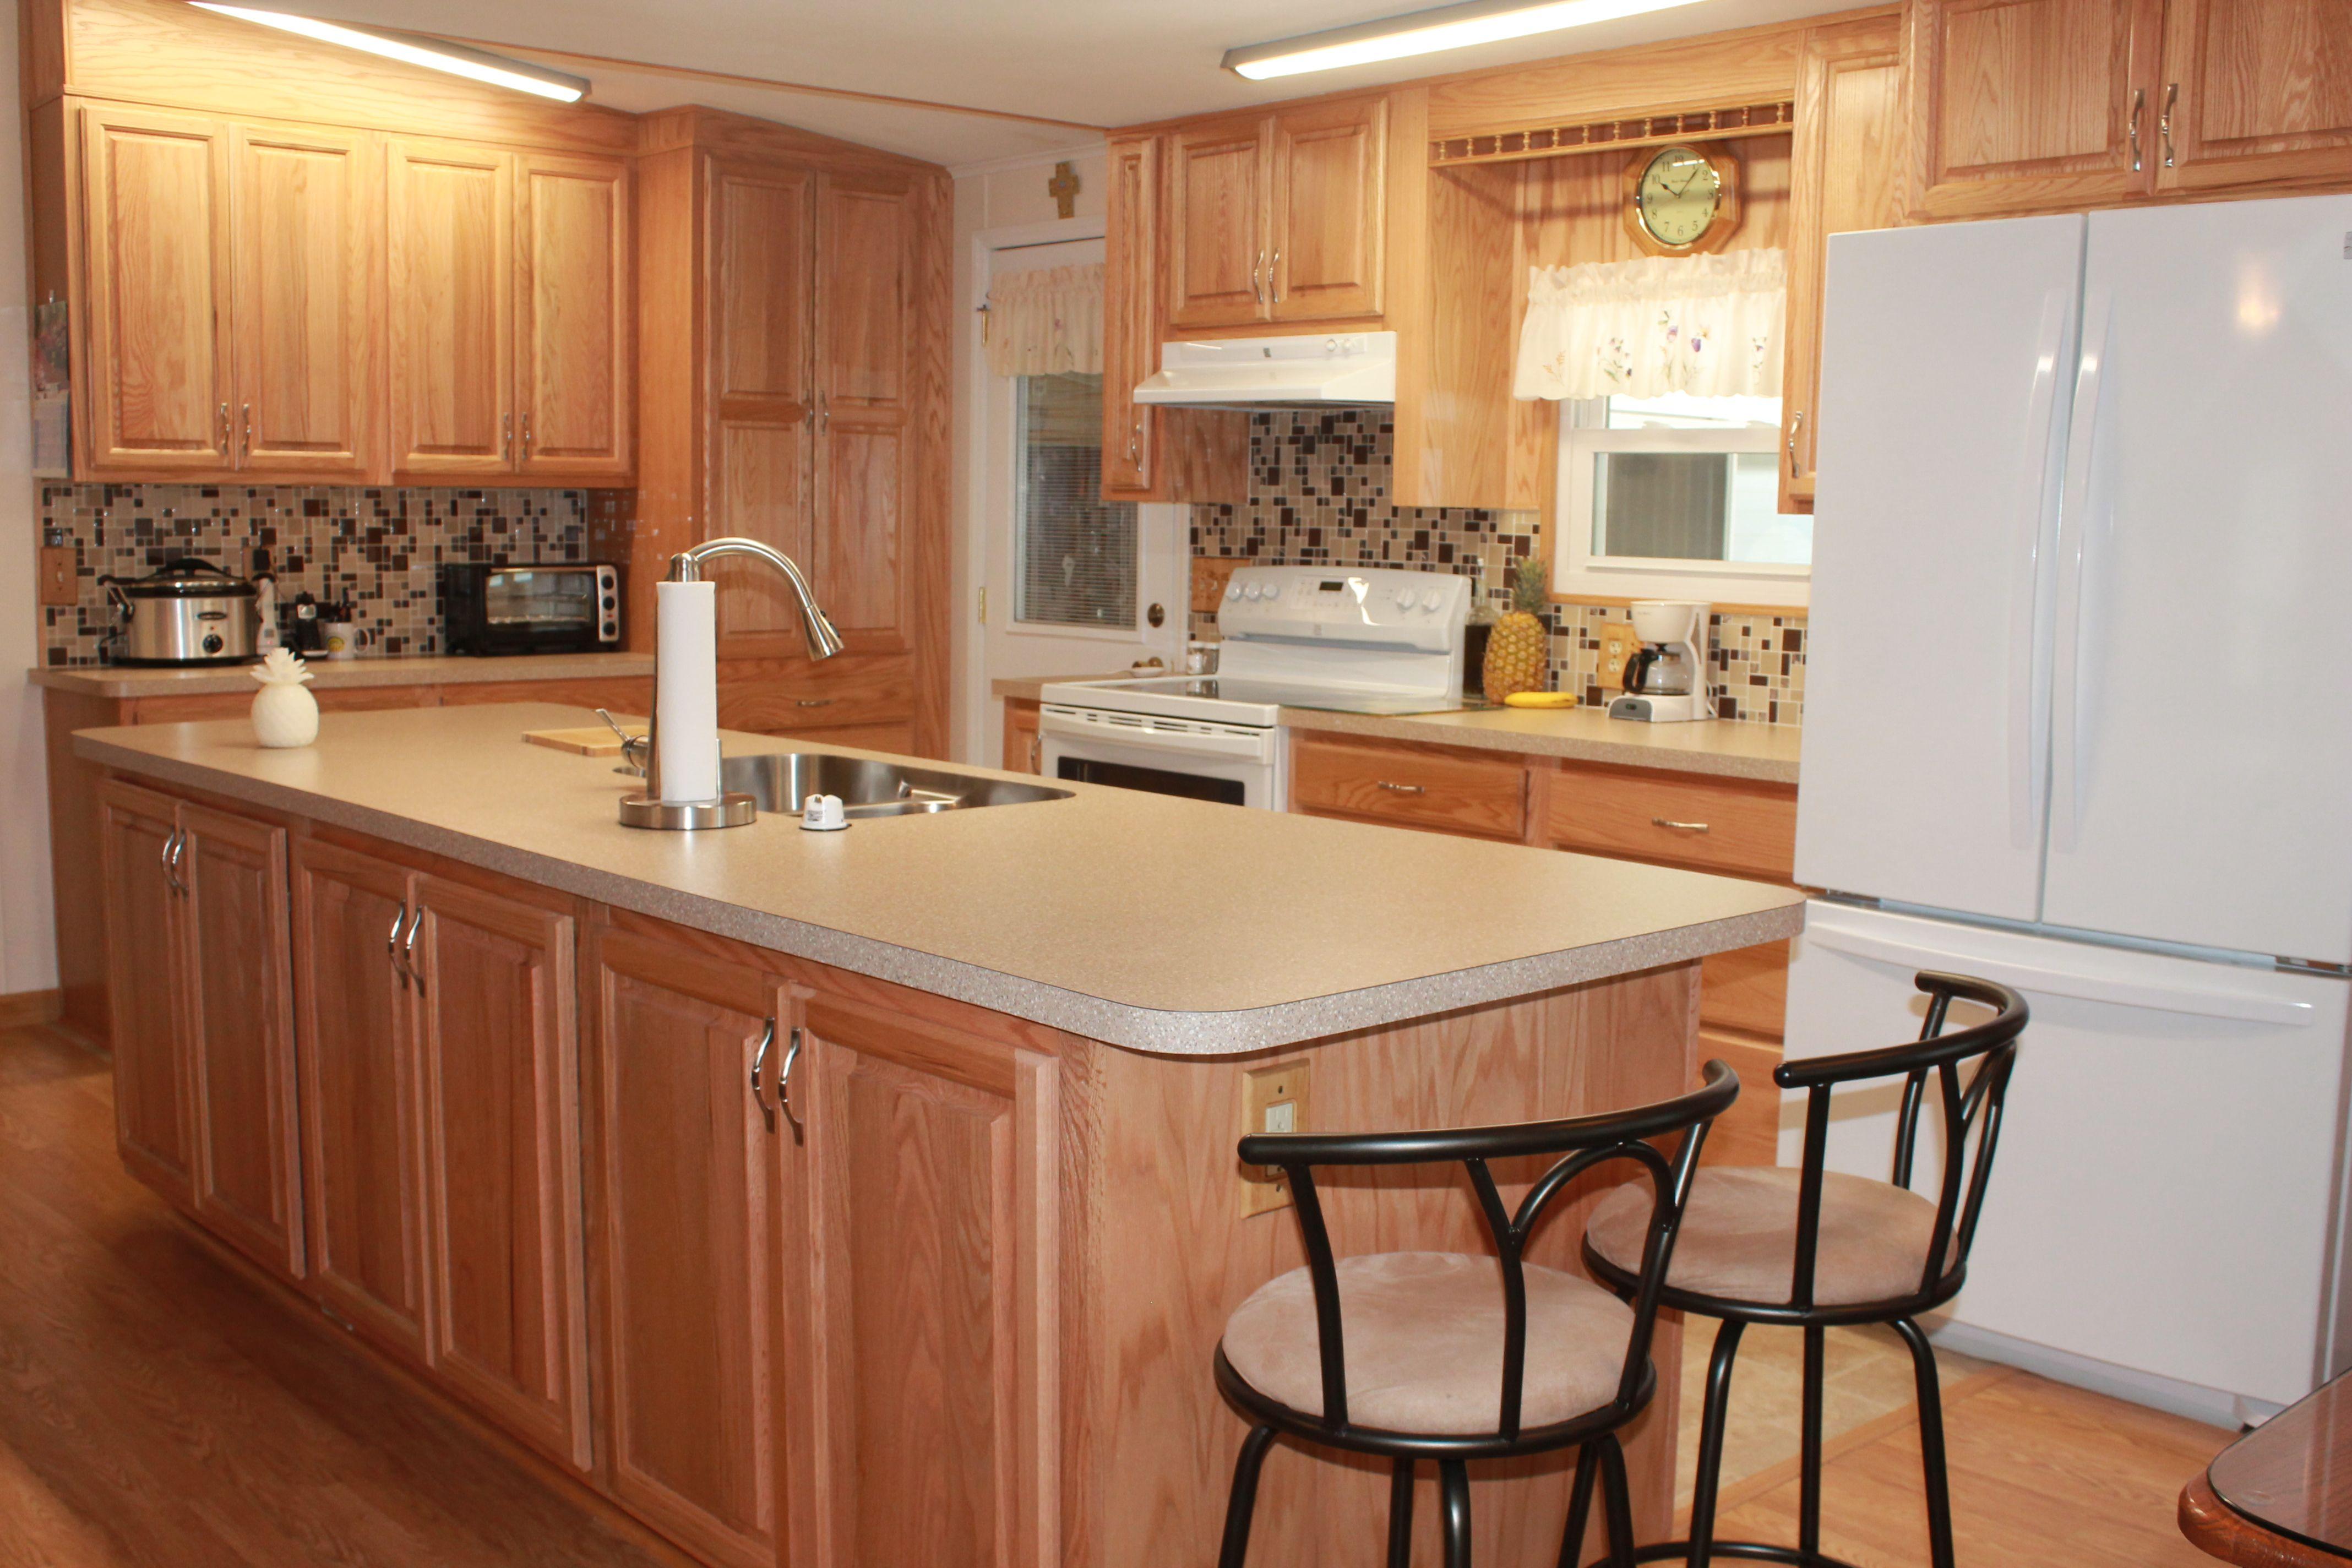 Concord Harvest Raised Panel Birch Cabinets Beautiful Kitchens Birch Cabinets Kitchen Remodel